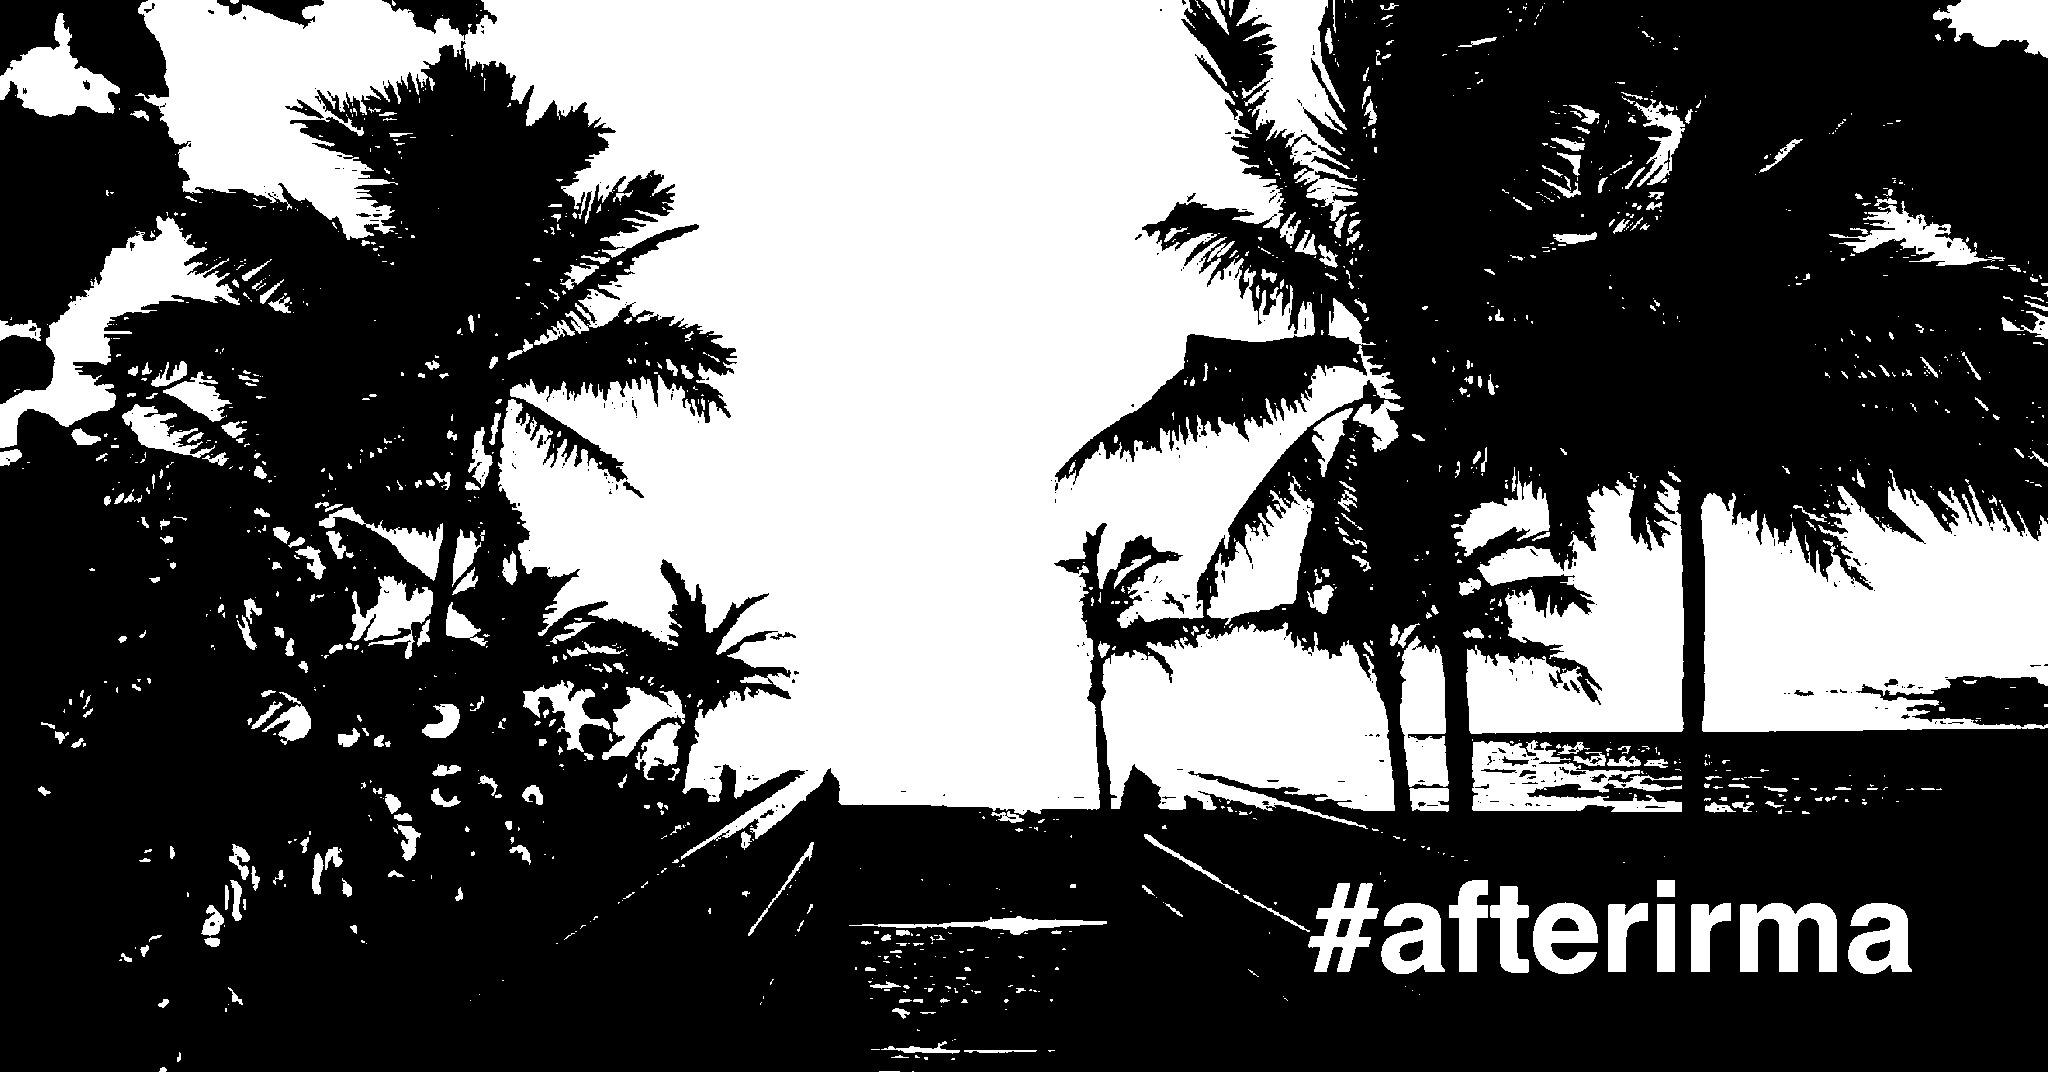 After-Irma-006.jpg